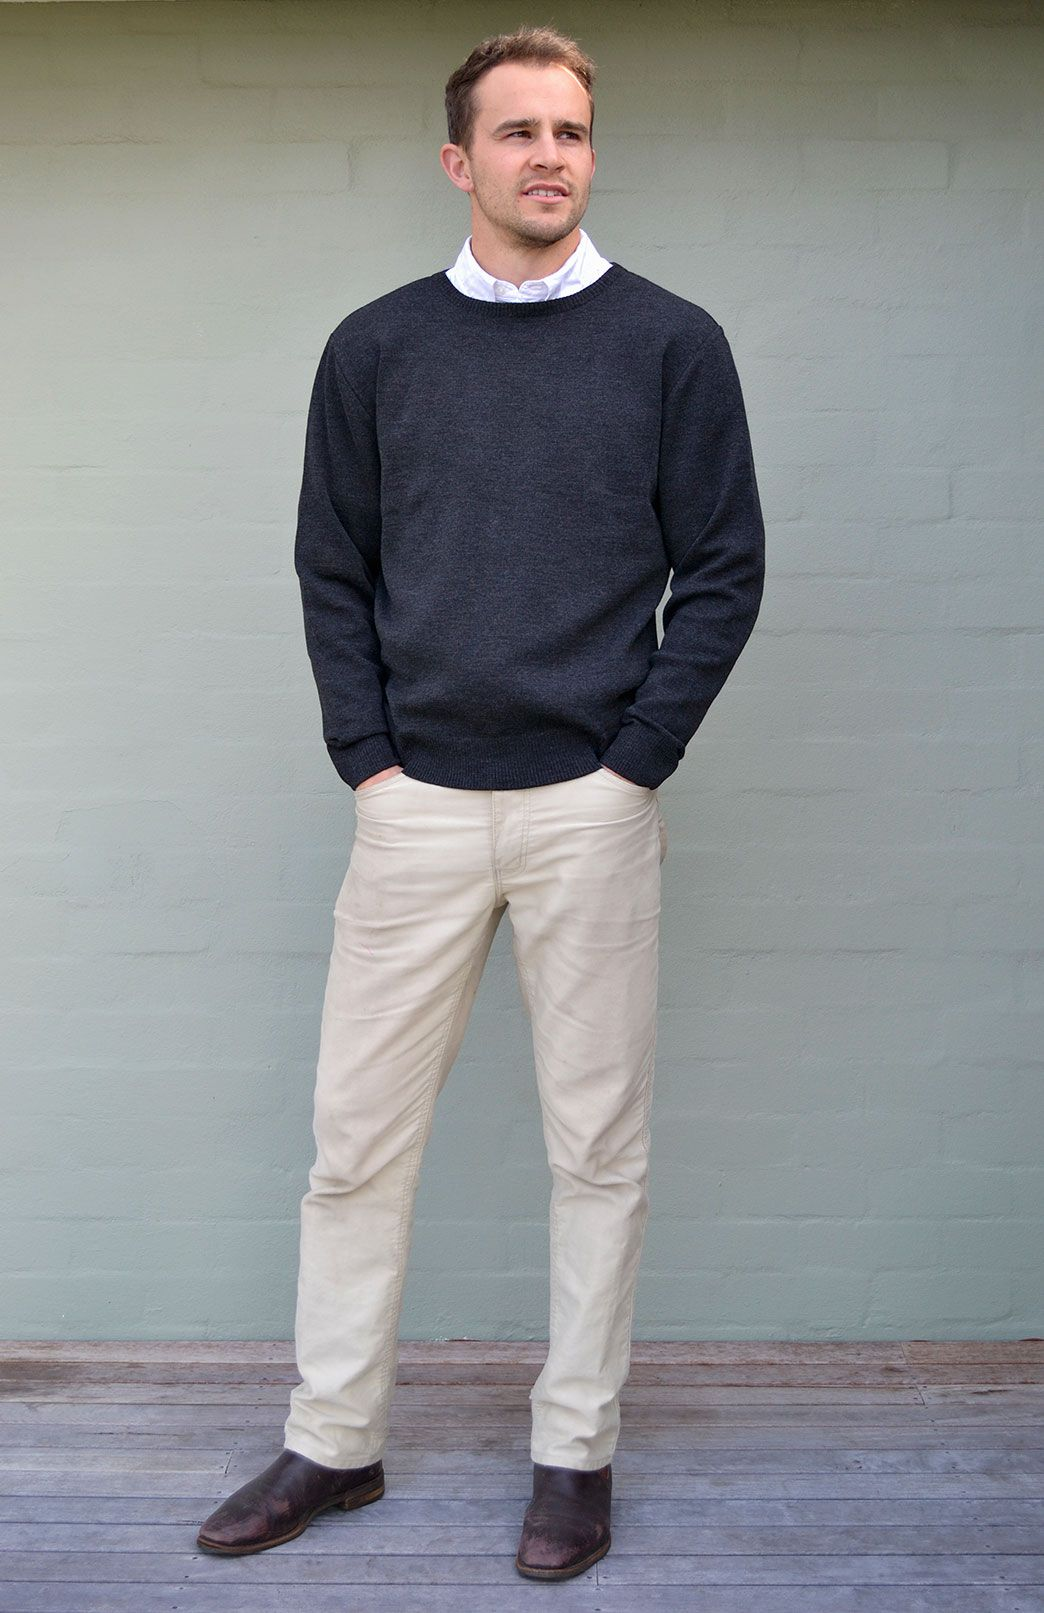 debb07b8b47386 Men's Chunky Crew Jumper Superfine merino wool Australian made by Smitten  Merino in Tasmania